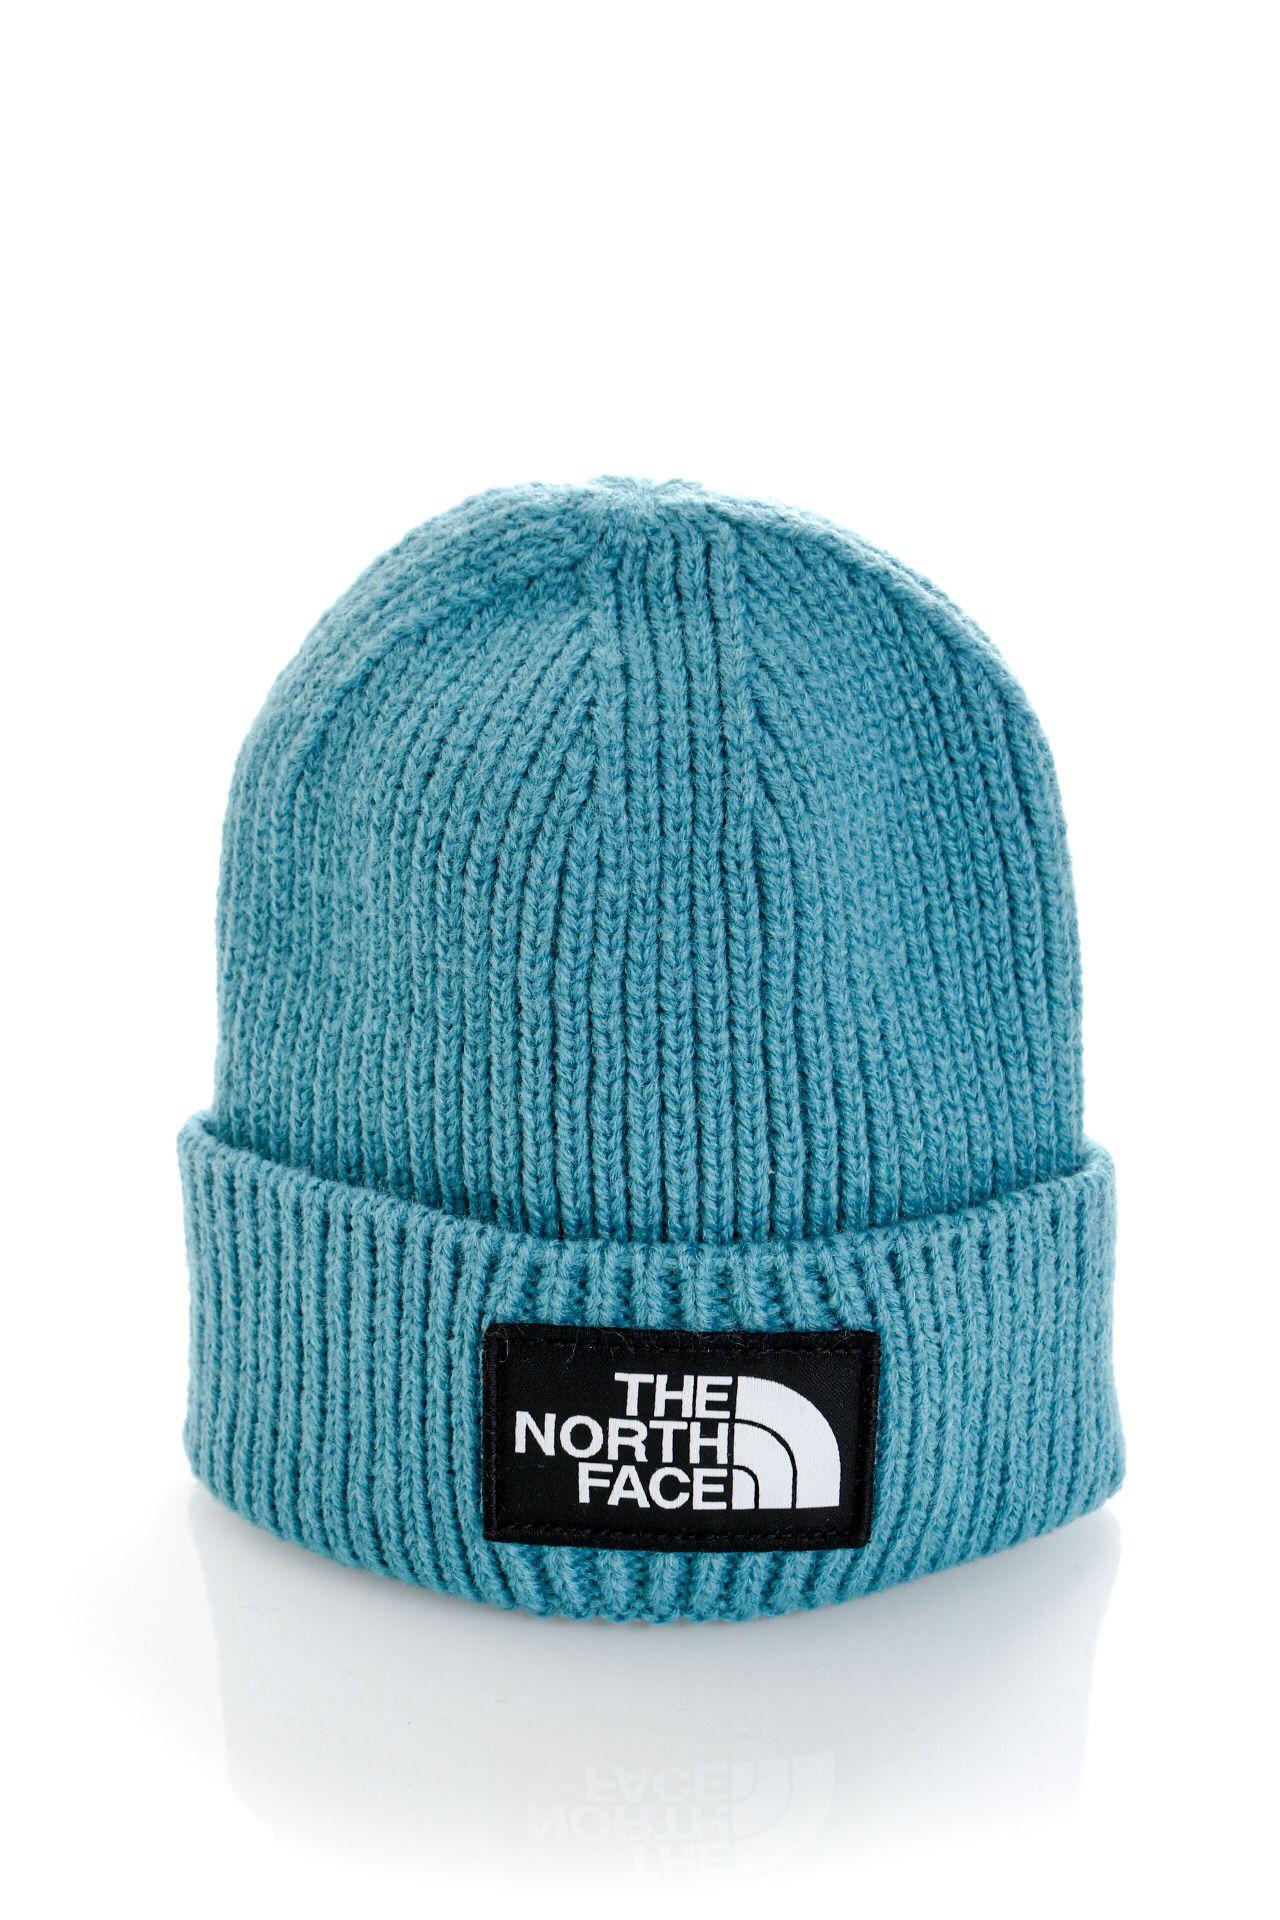 Afbeelding van The North Face Muts TNF LOGO BOX CUFFED SHT STORM BLUE NF0A3FJX4Y31